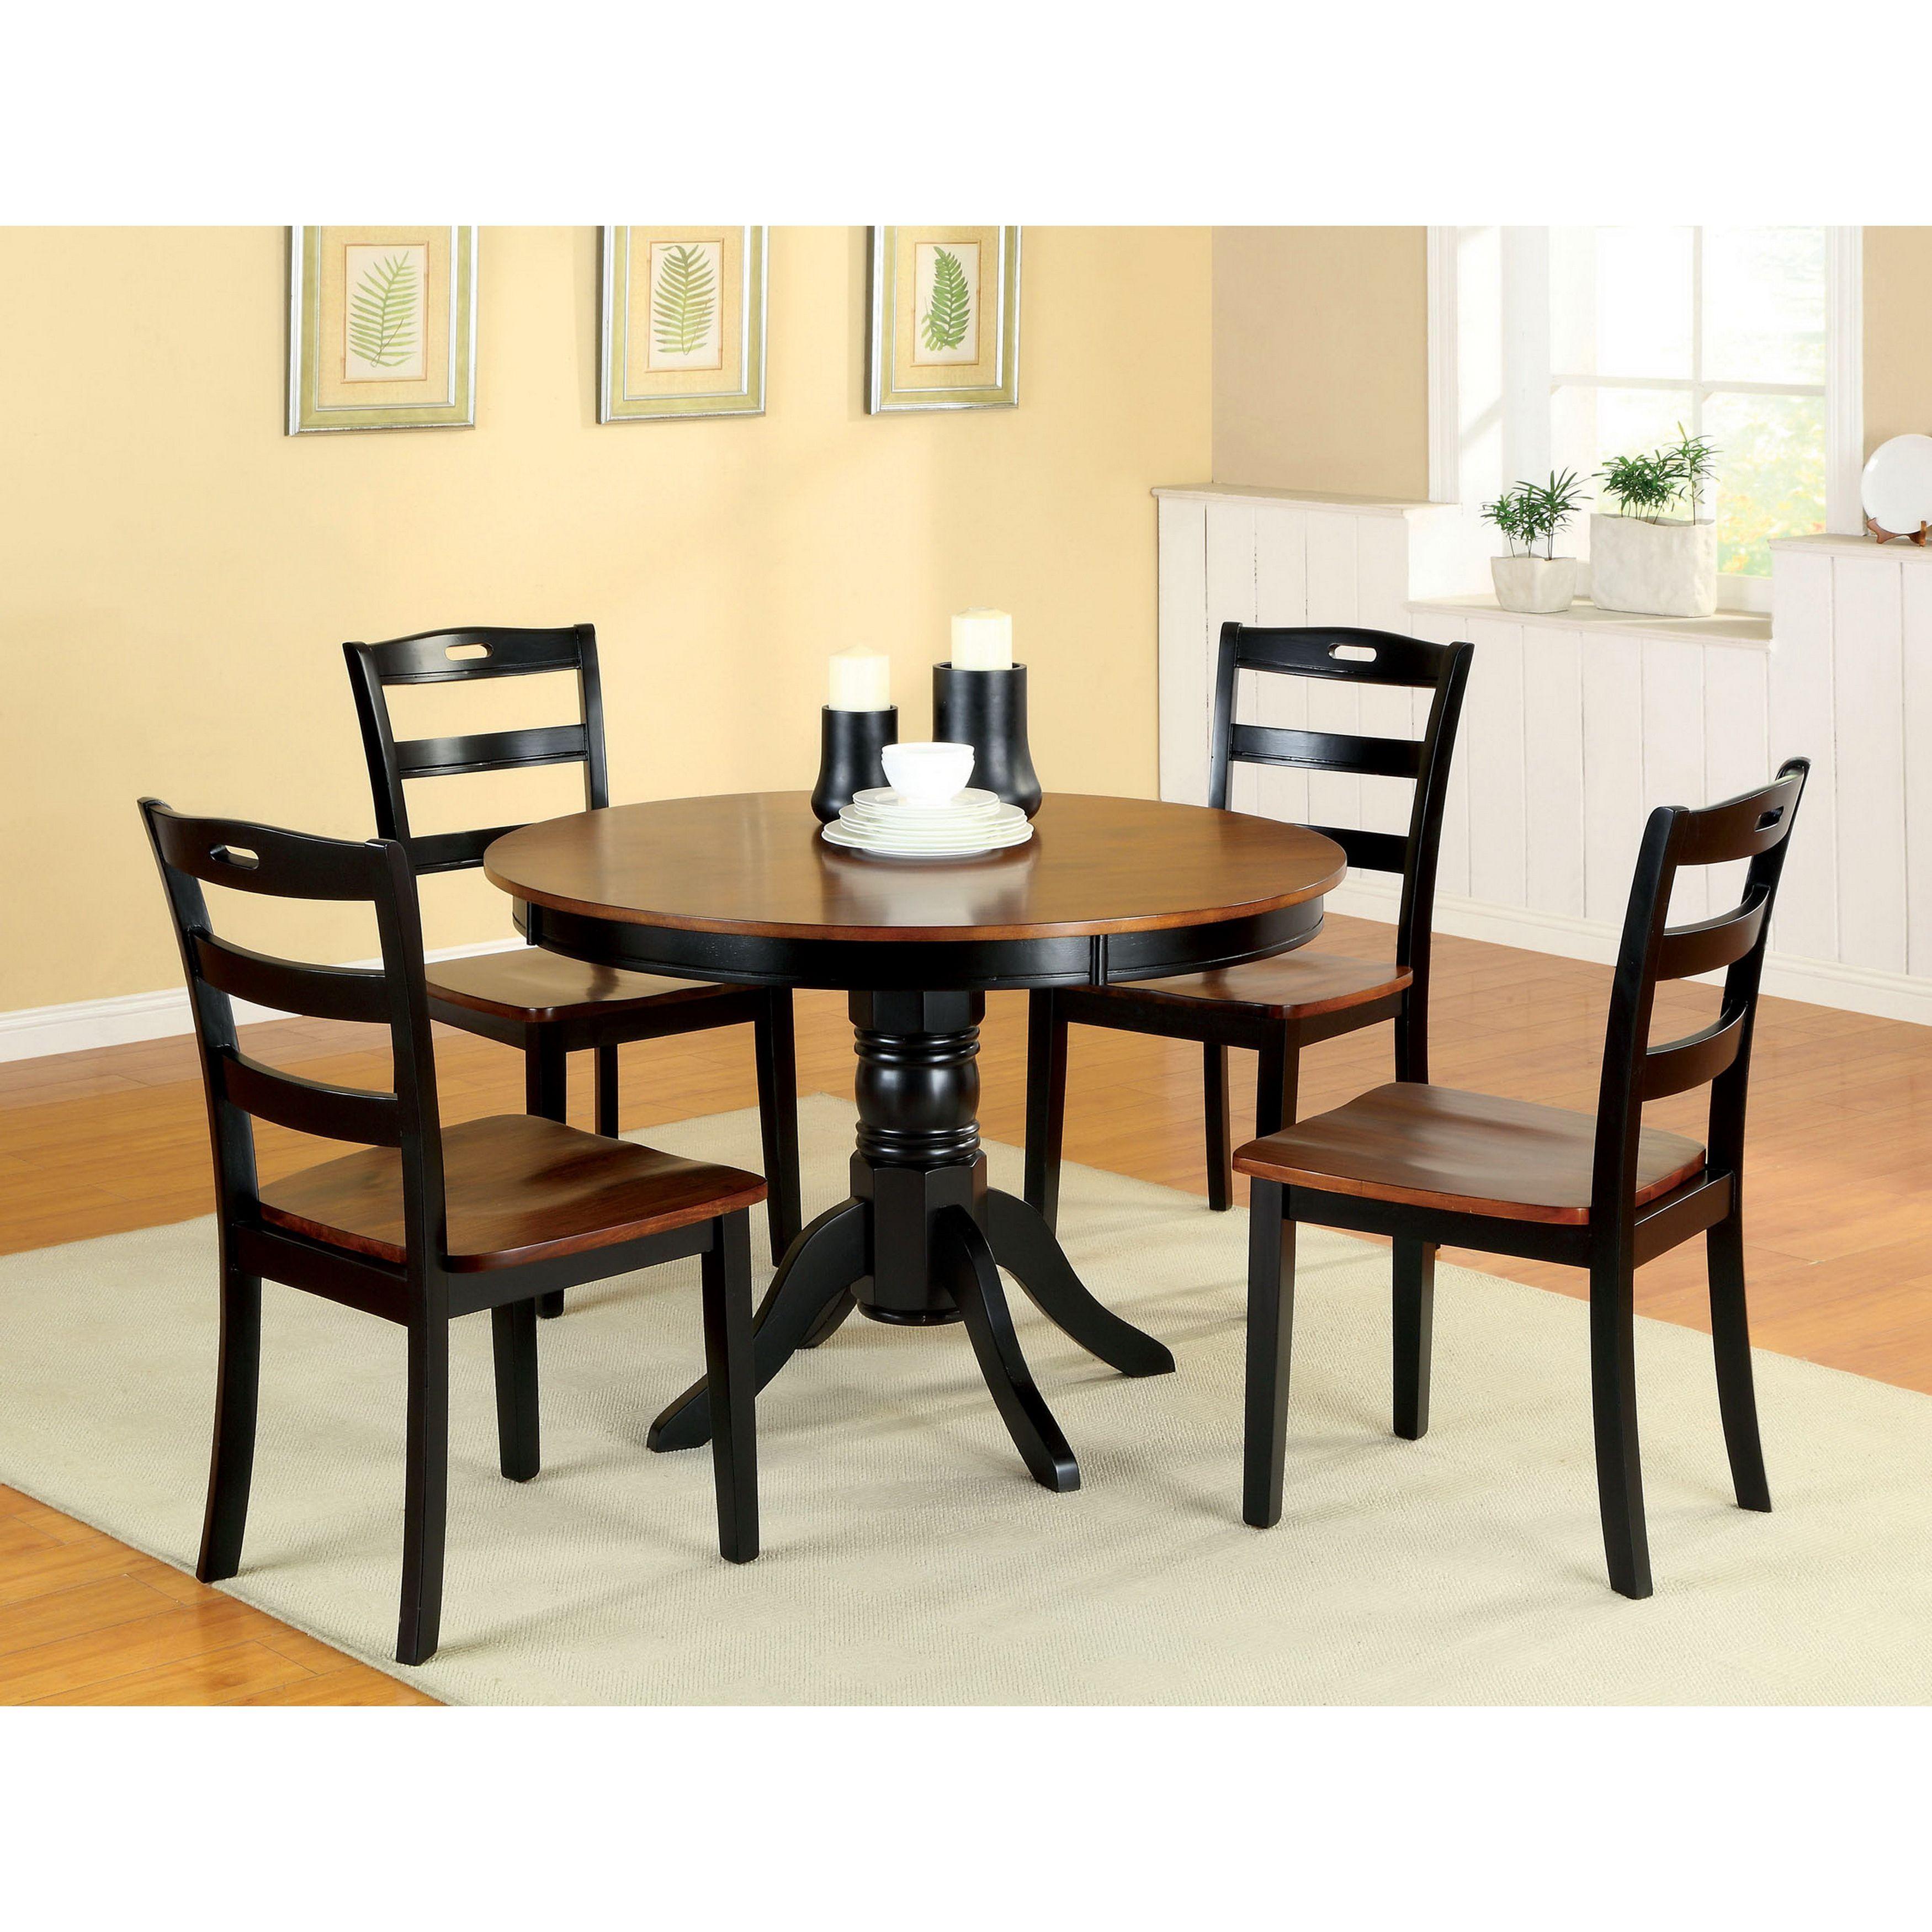 Buy Kitchen Dining Room Sets Online At Overstock Our Best Dining Room Bar Furniture Deals Dining Room Small Dining Room Bar Round Dining Table